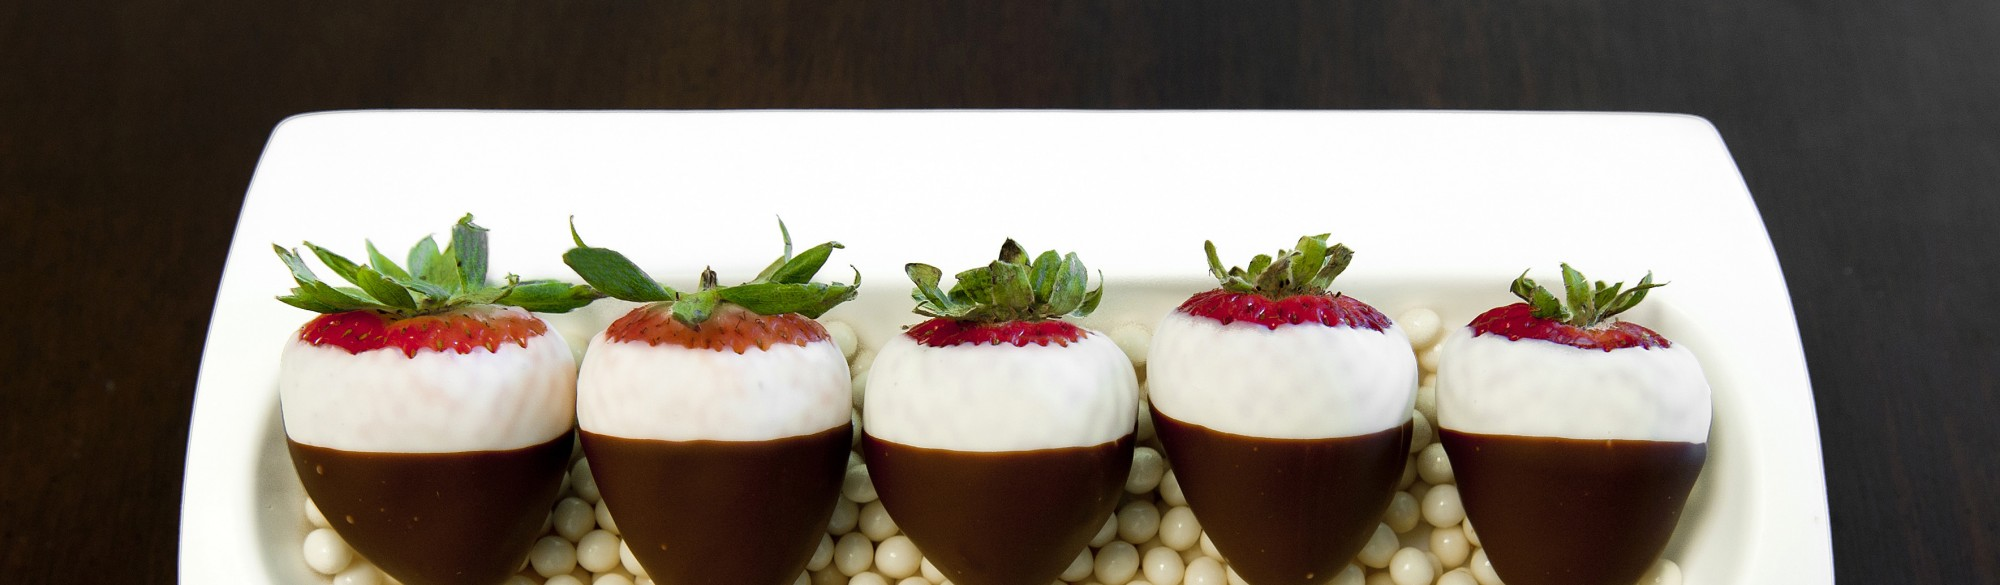 Chocolate_Covered_Strawberries_002